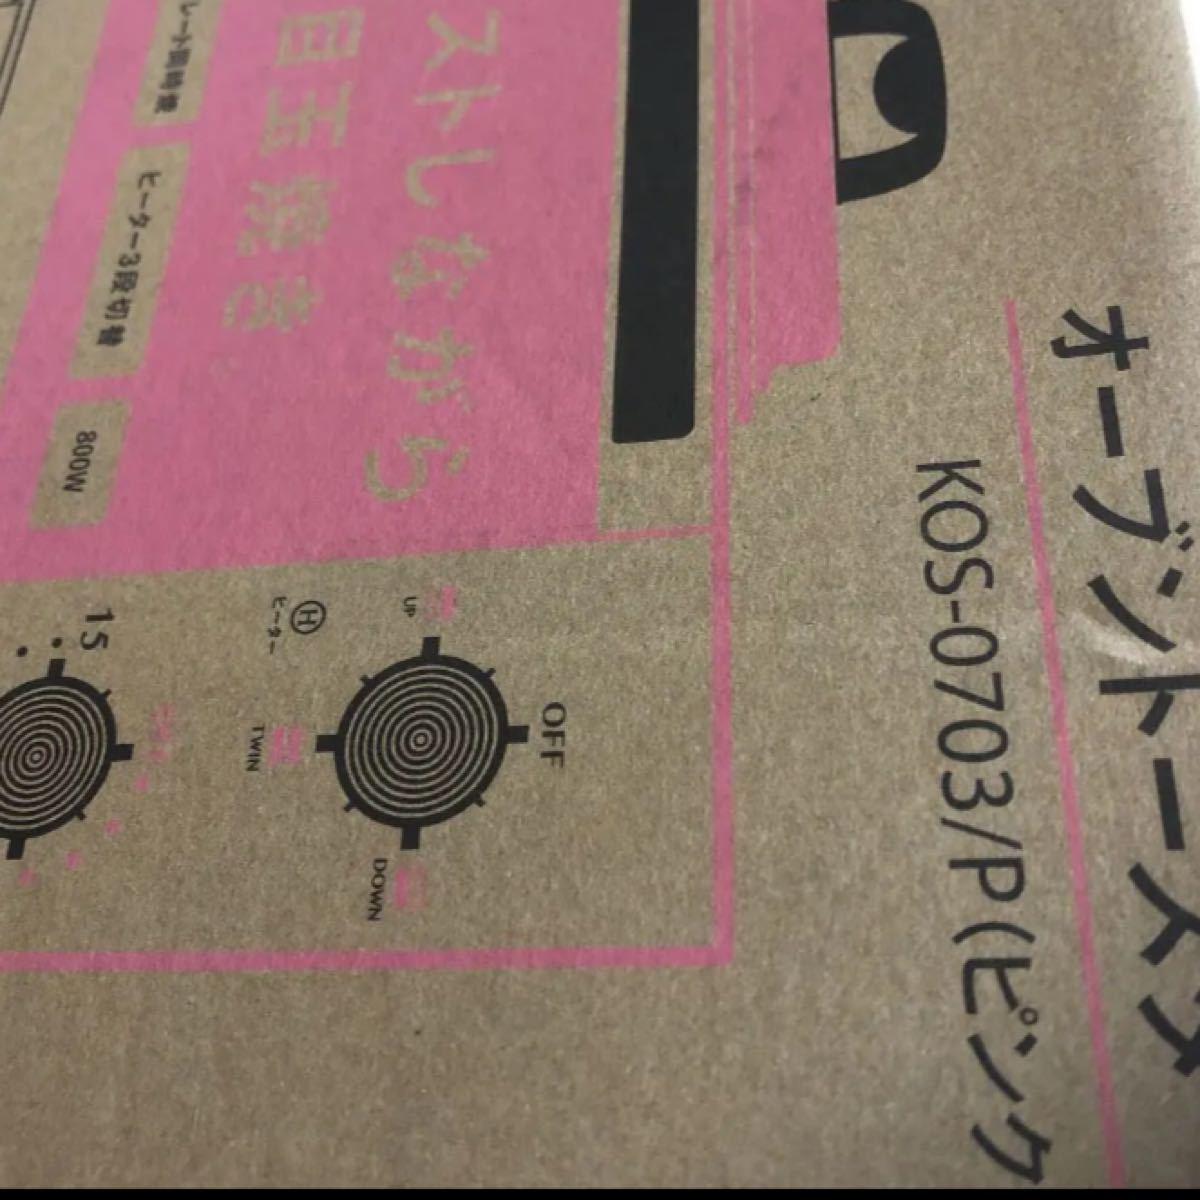 KOIZUMI KOS-0703/P オーブントースター ピンク コイズミオーブントースター